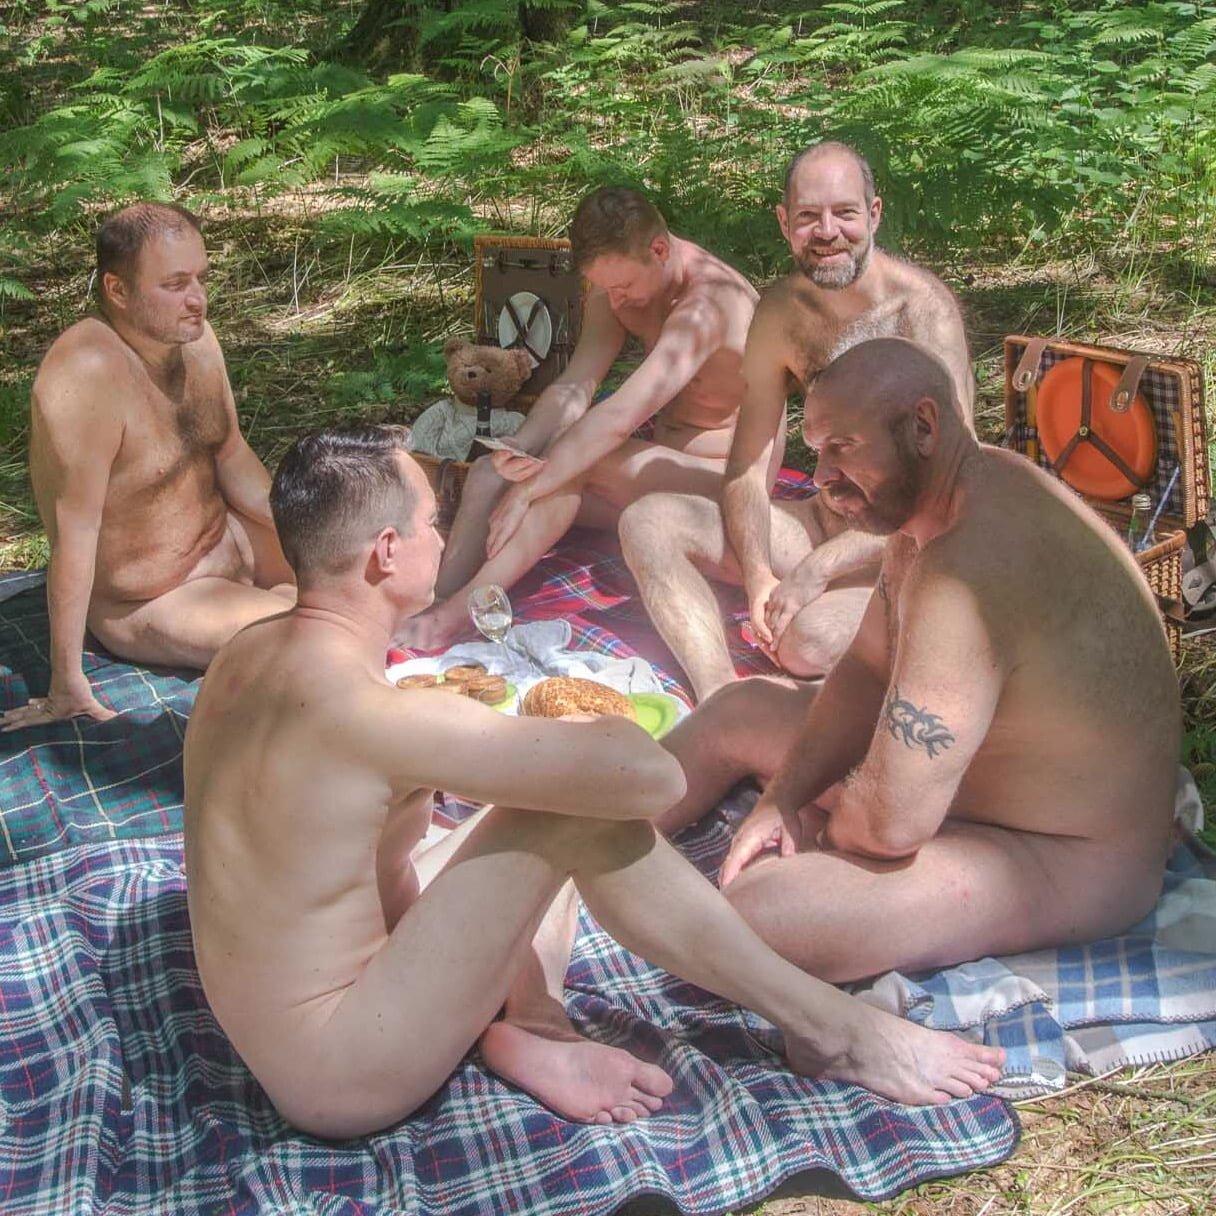 any gay vaccume tube videos